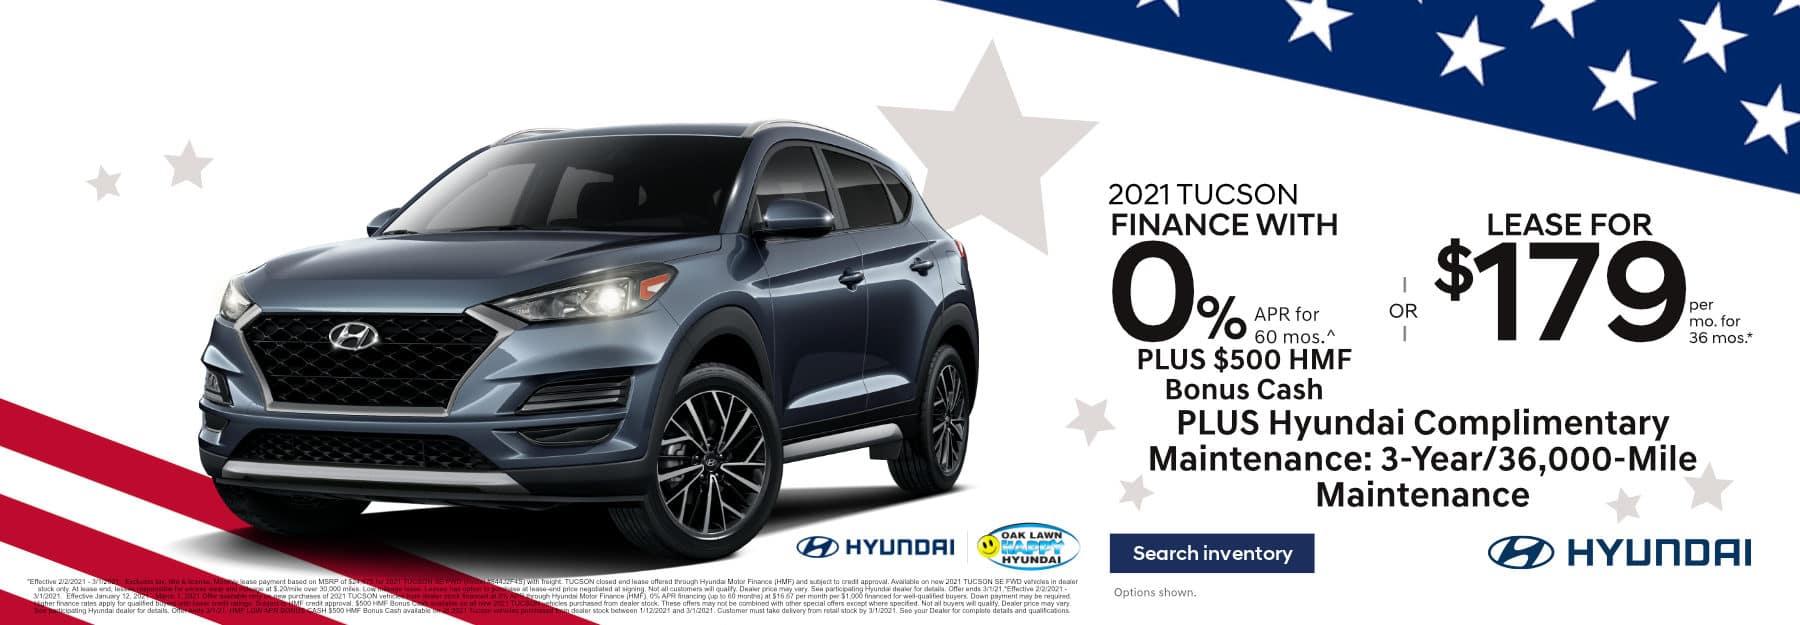 February_2021_Tucson_Happy_Hyundai